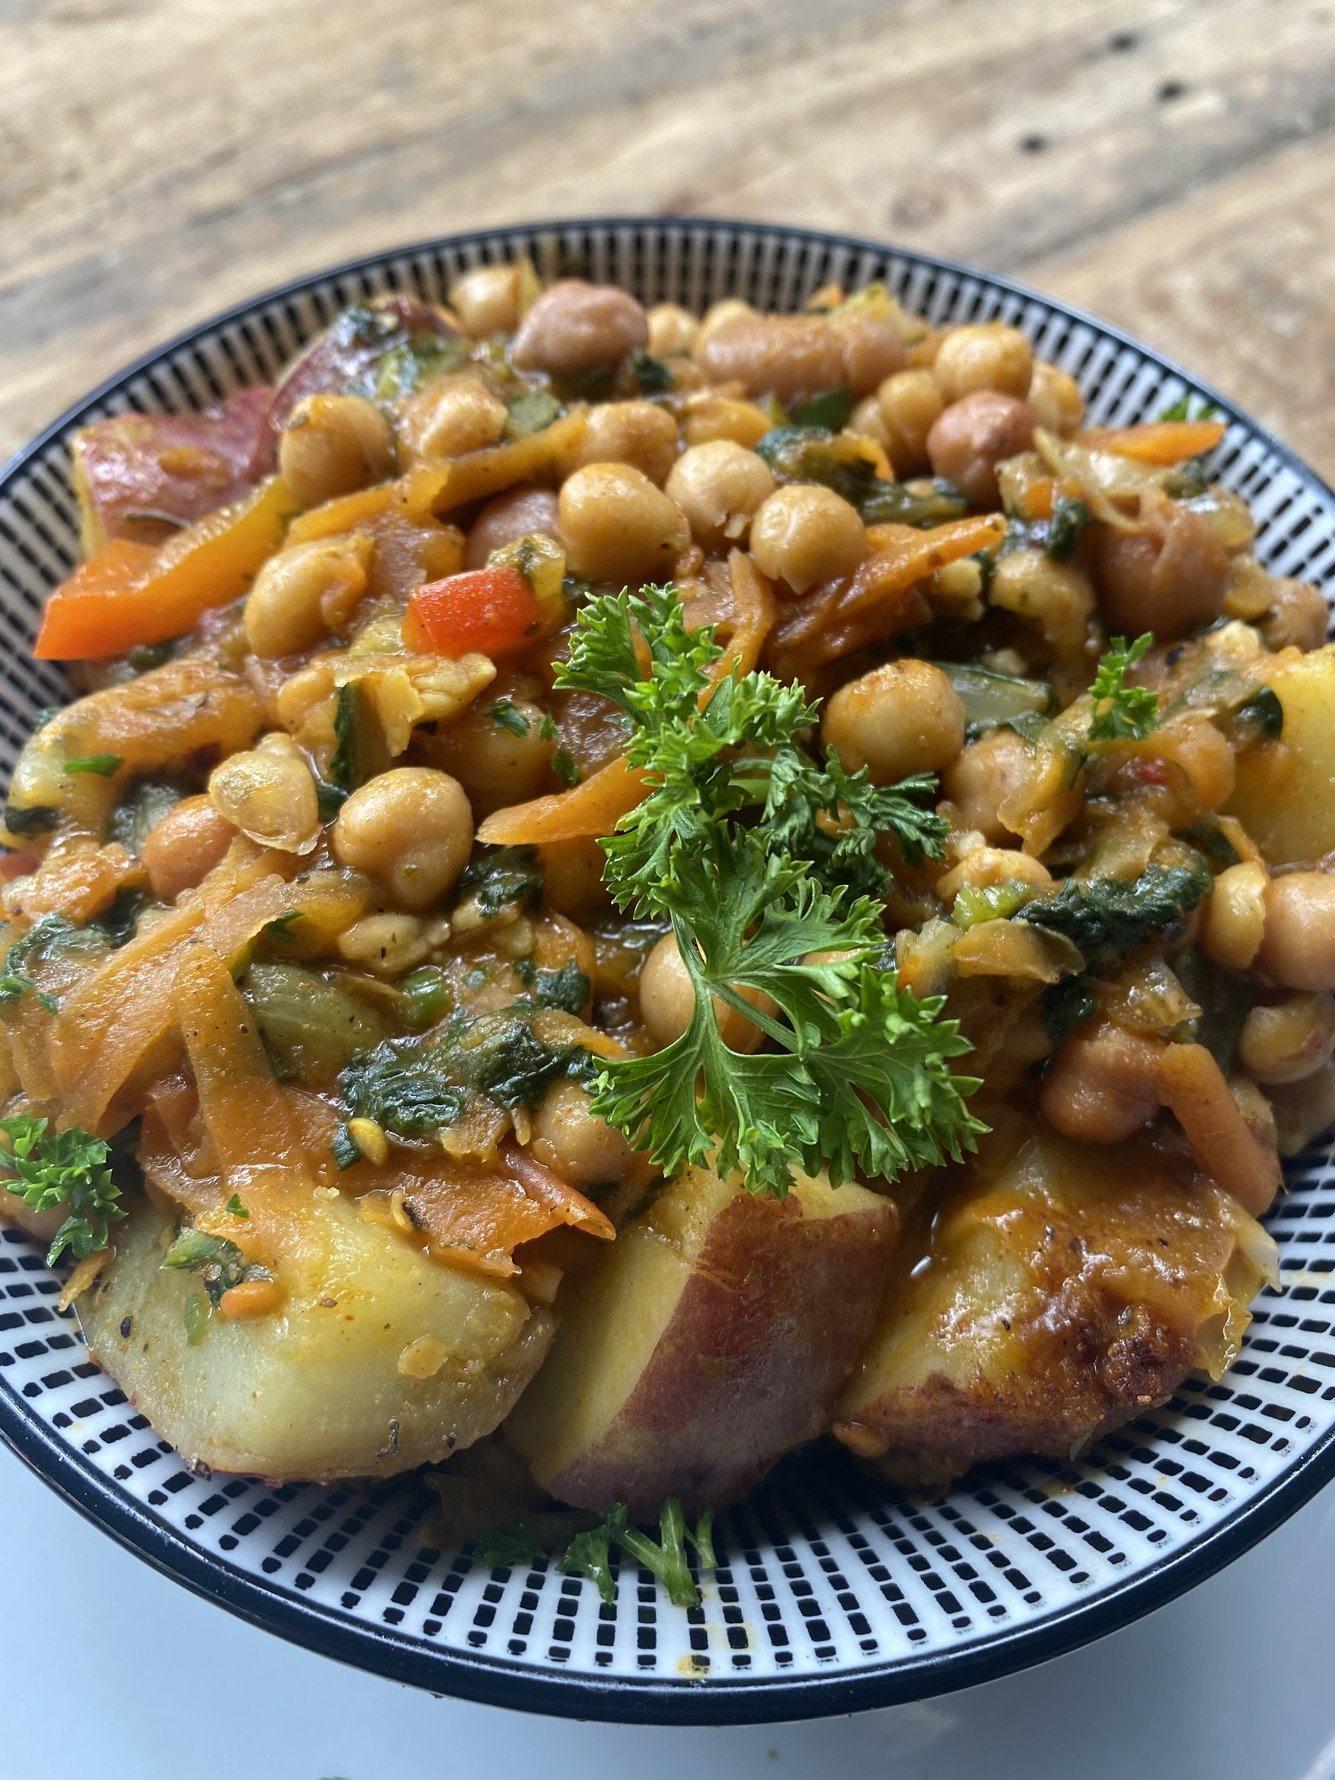 Delicious vegetarian options at Xavier Maboneng